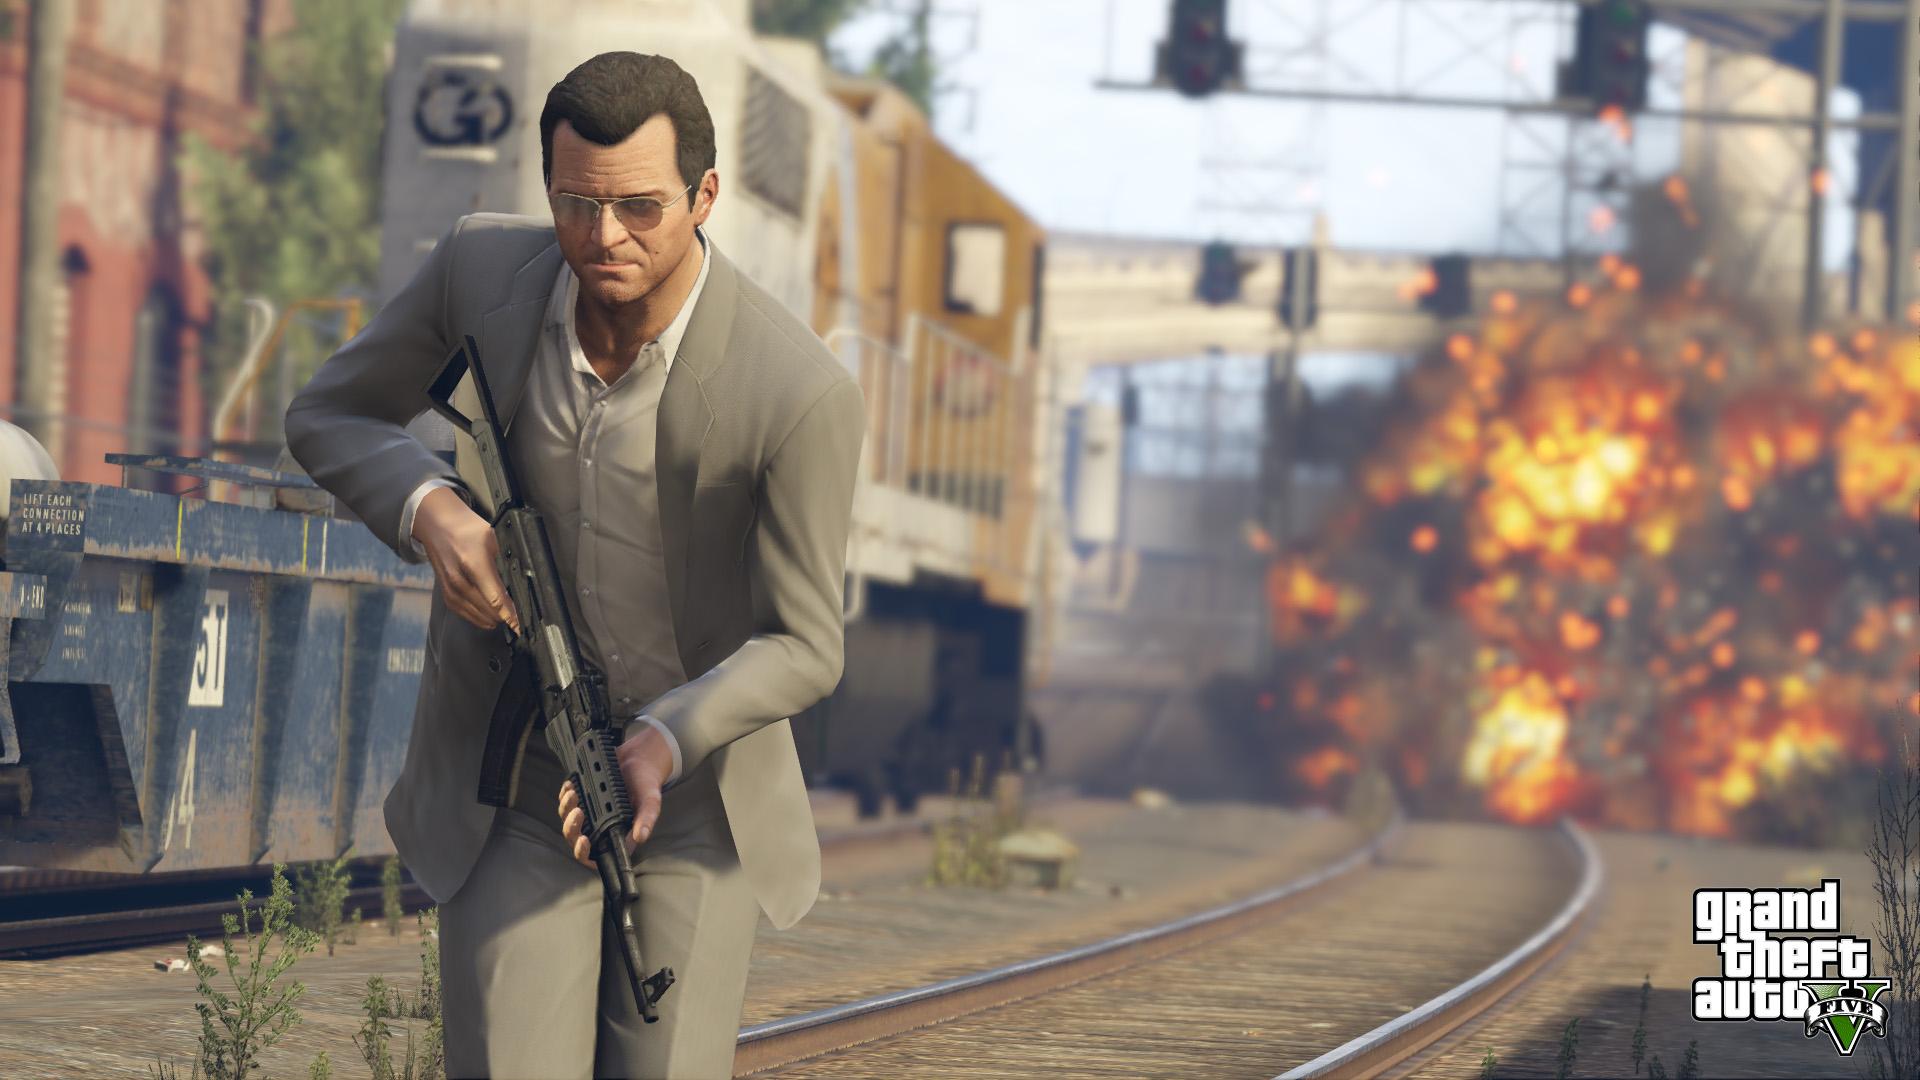 Twitch Stream Follows The Lives of Grand Theft Auto V NPCs